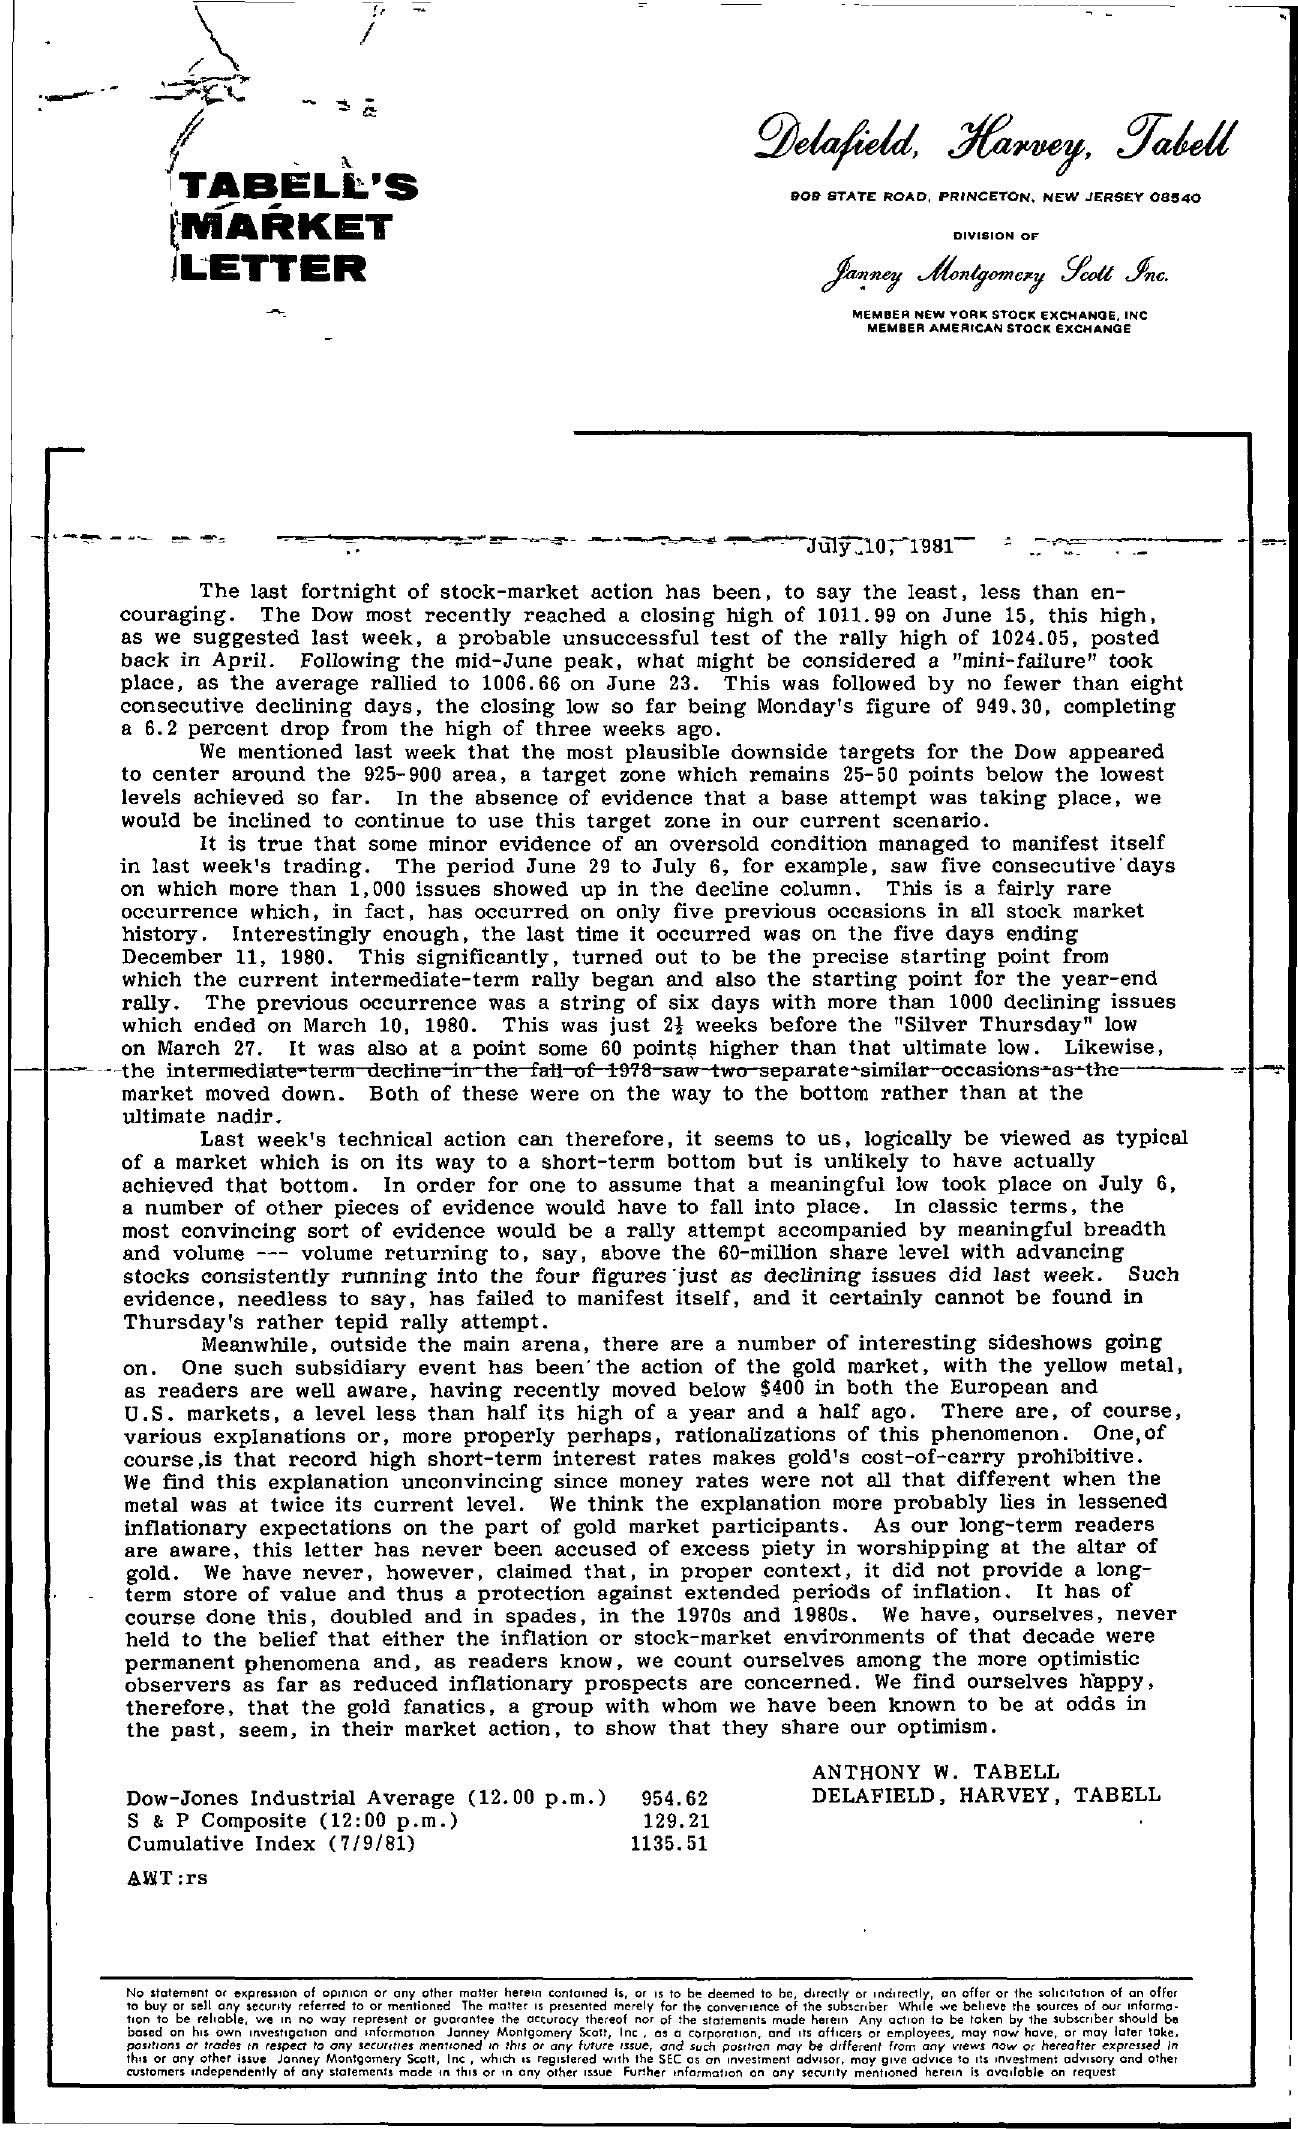 Tabell's Market Letter - July 10, 1981